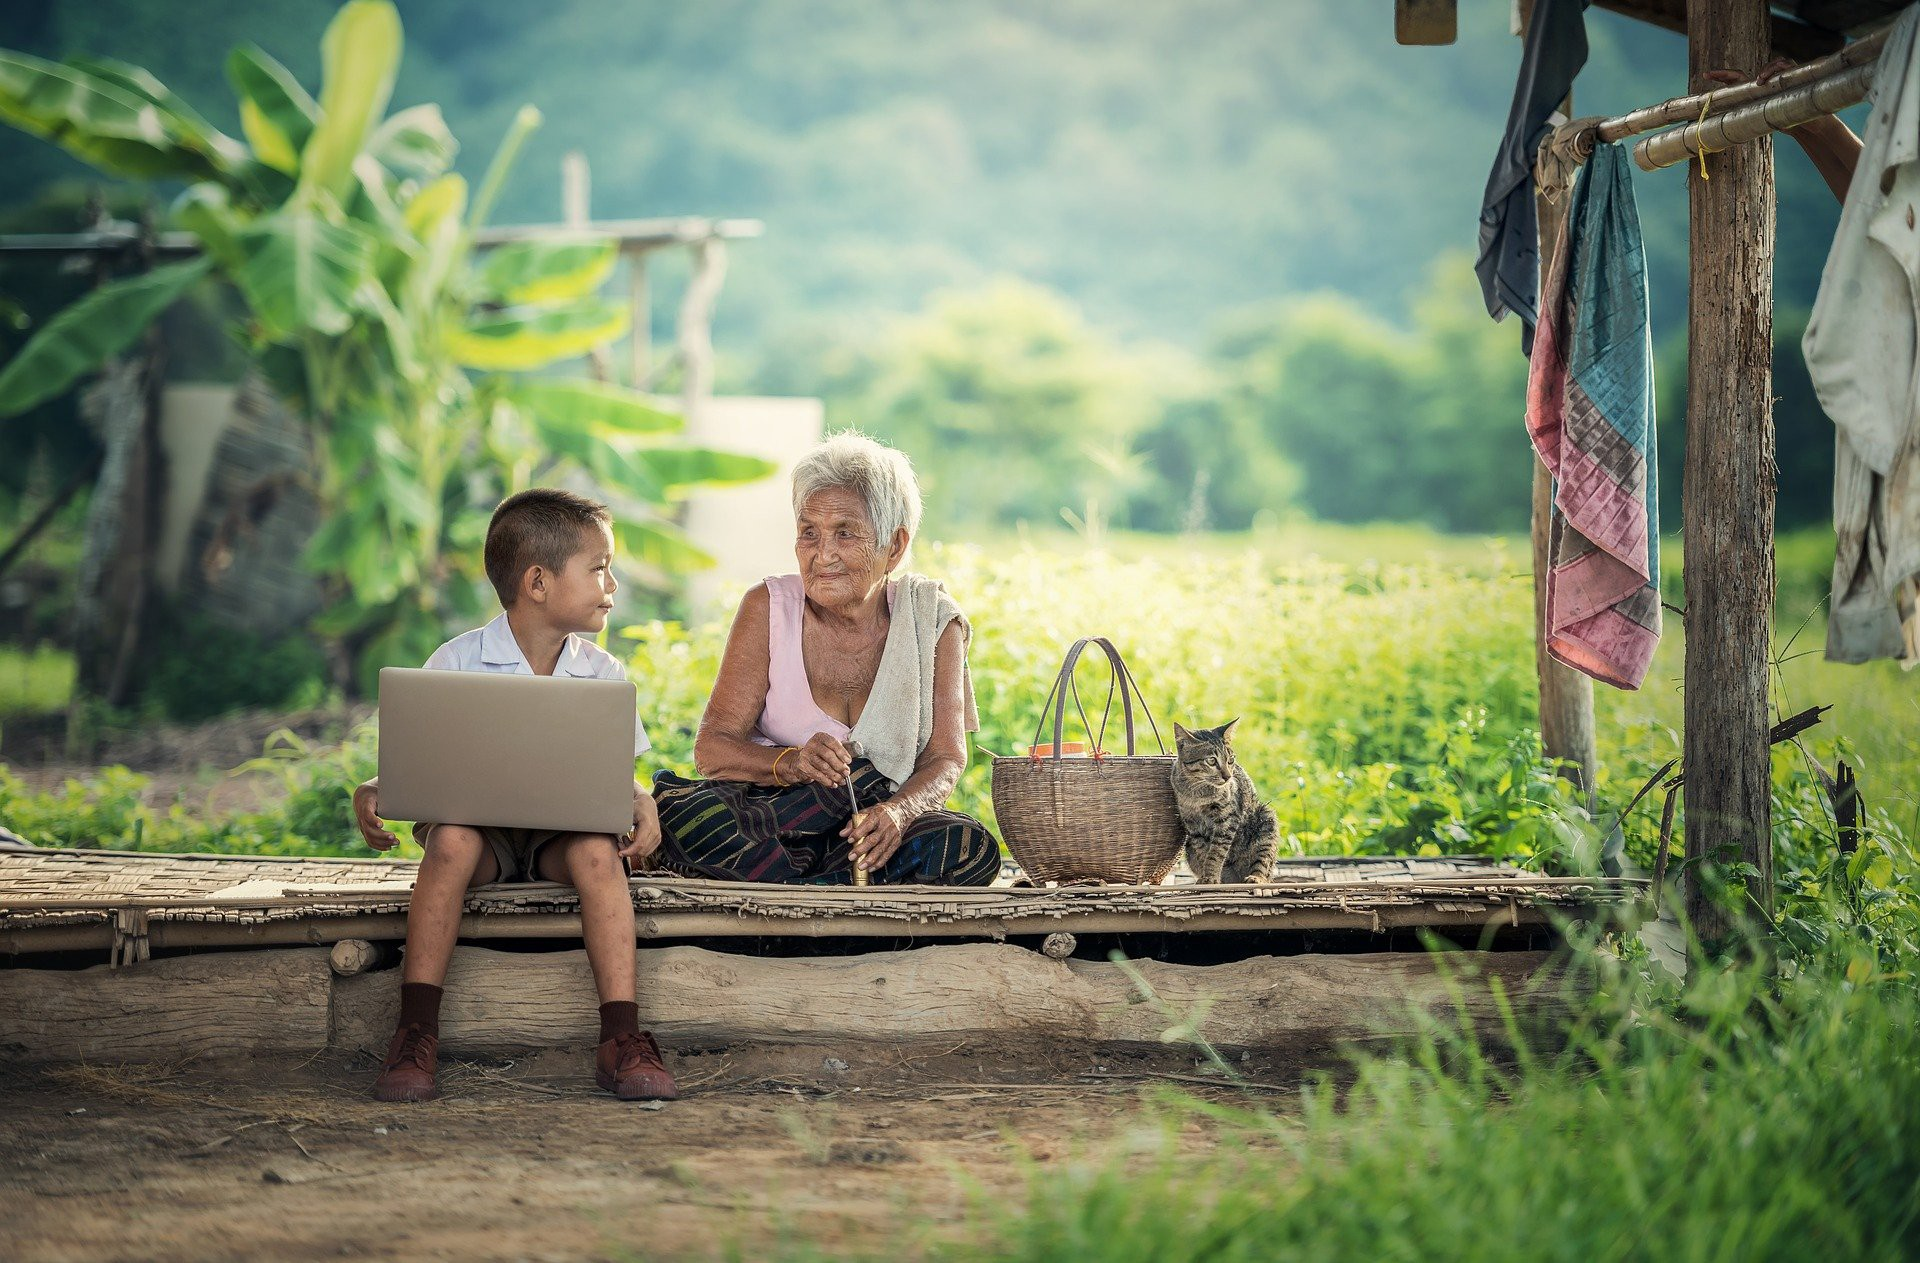 Neto e avó conversam enquanto ele usa laptop